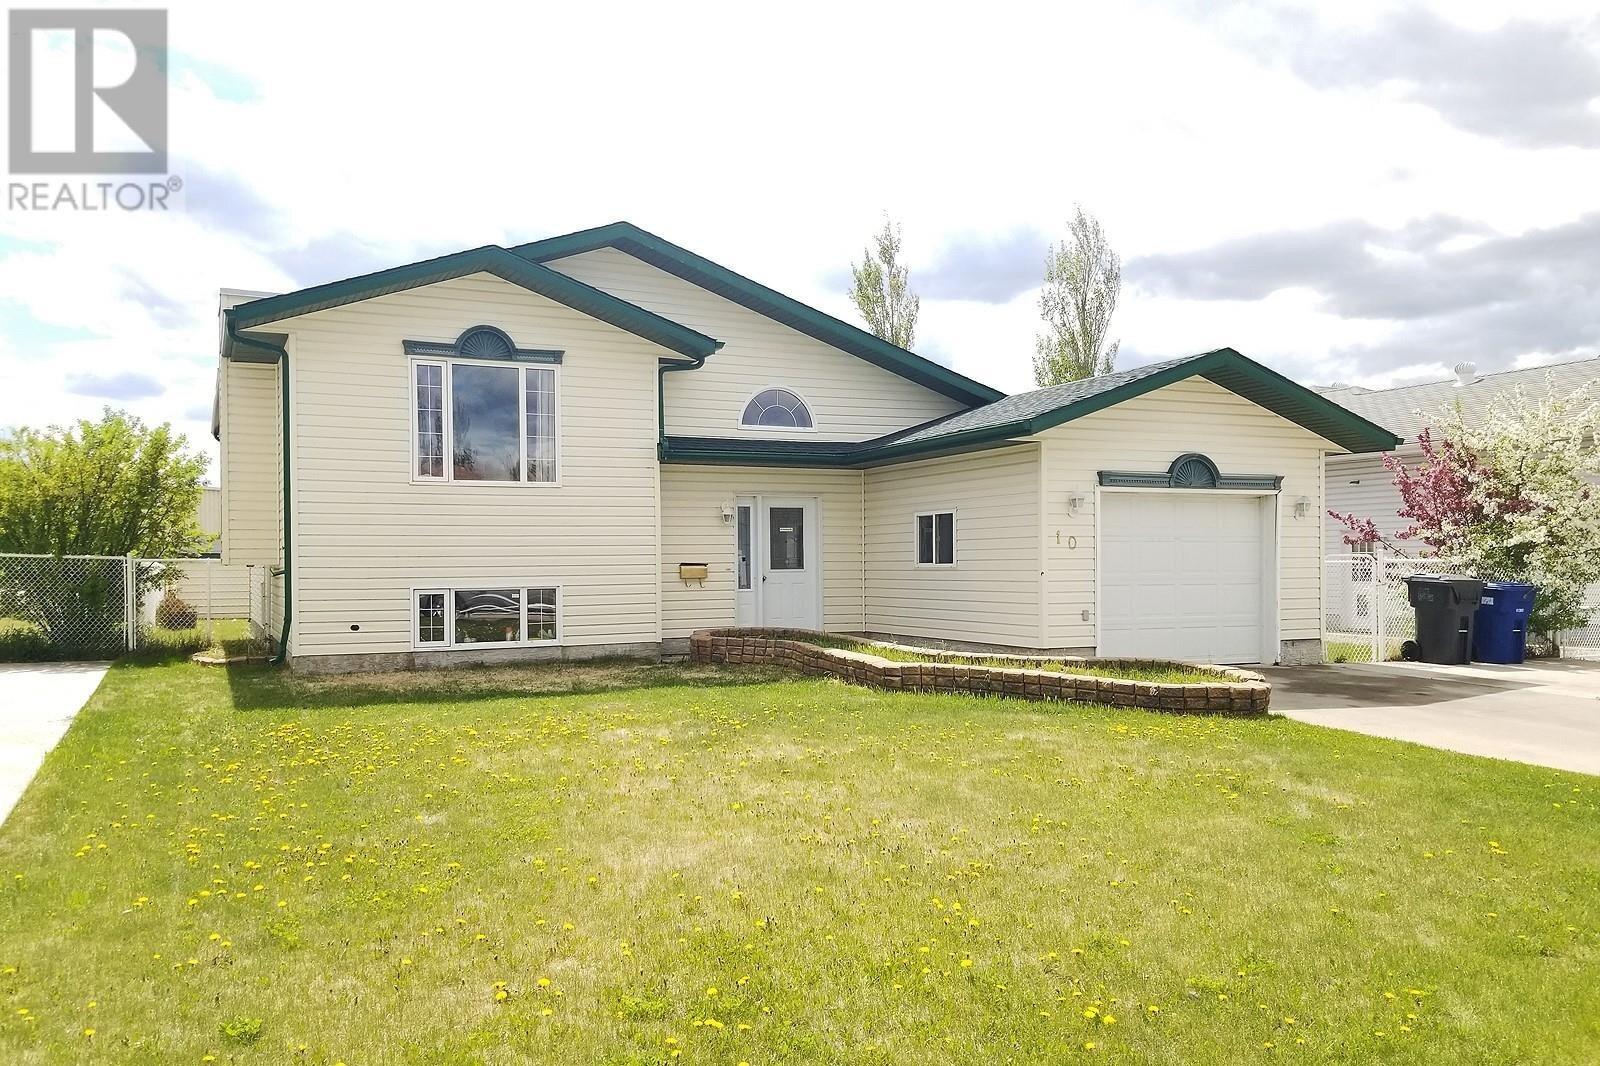 House for sale at 10 Jackson Dr Meadow Lake Saskatchewan - MLS: SK828323